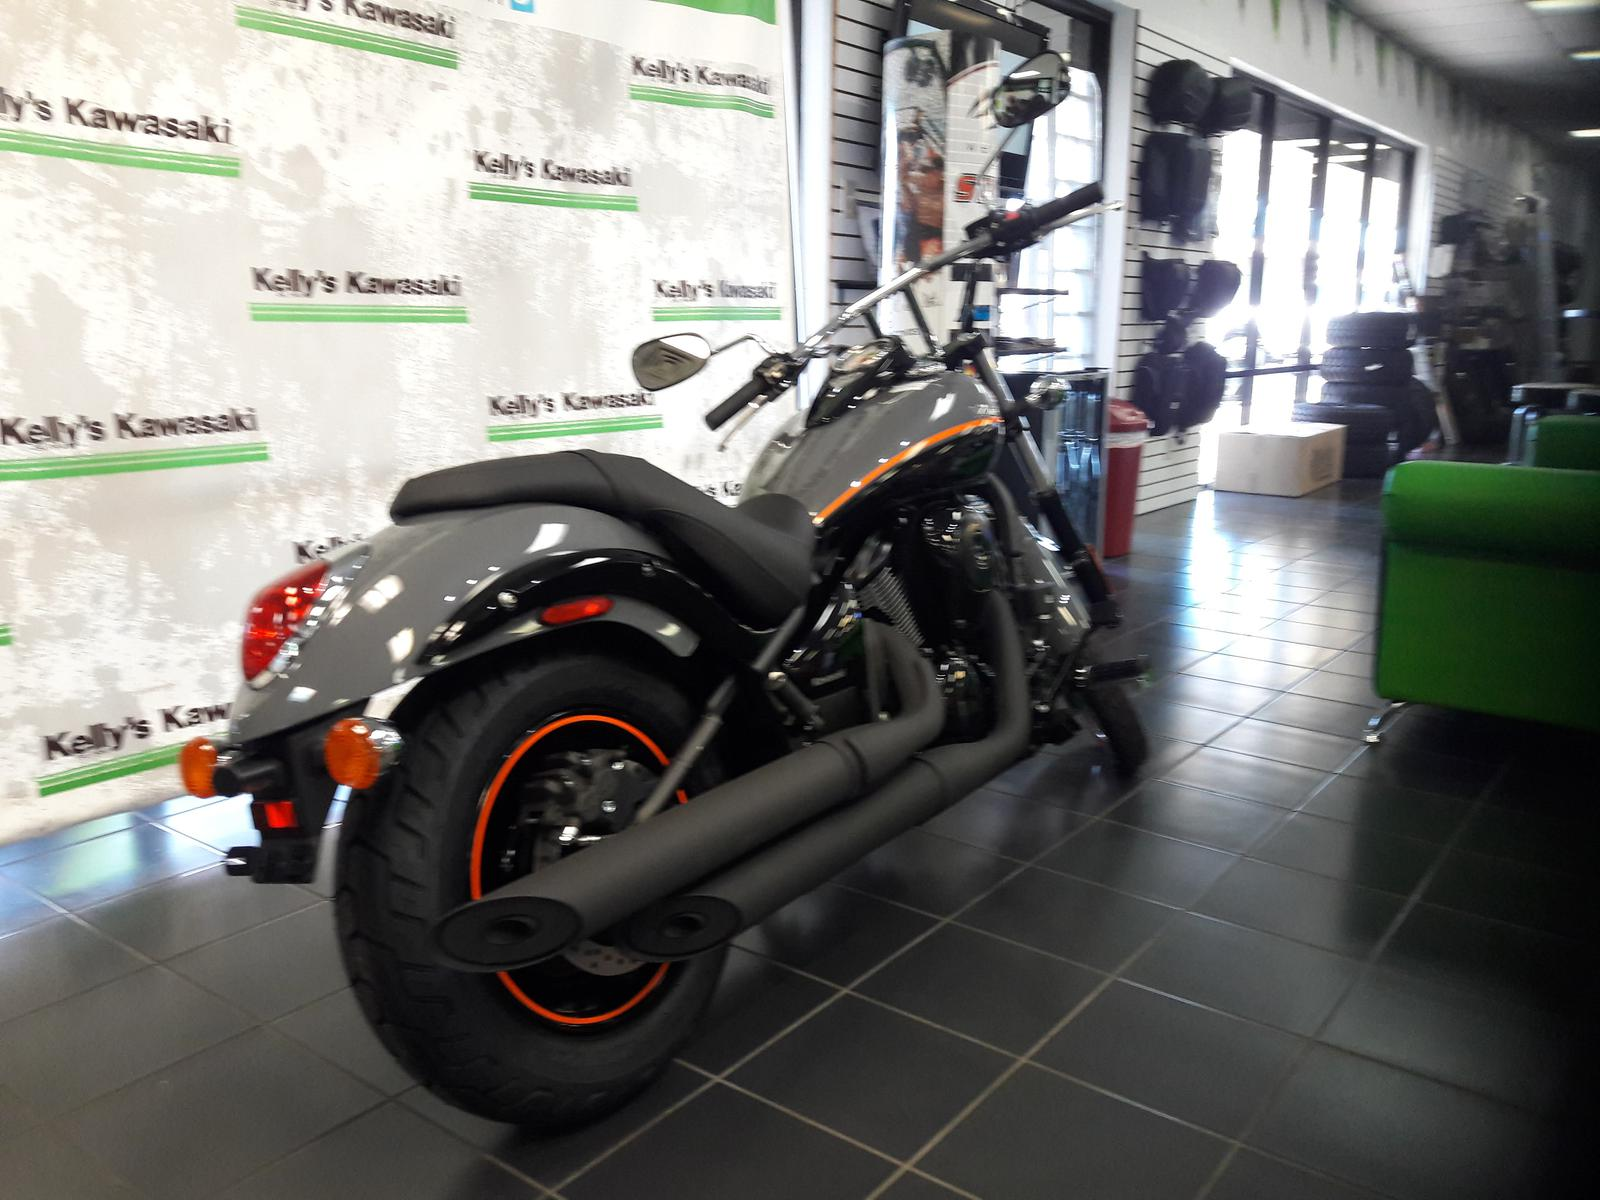 2019 Kawasaki Vulcan 900 Custom For Sale In Mesa Az Kellys